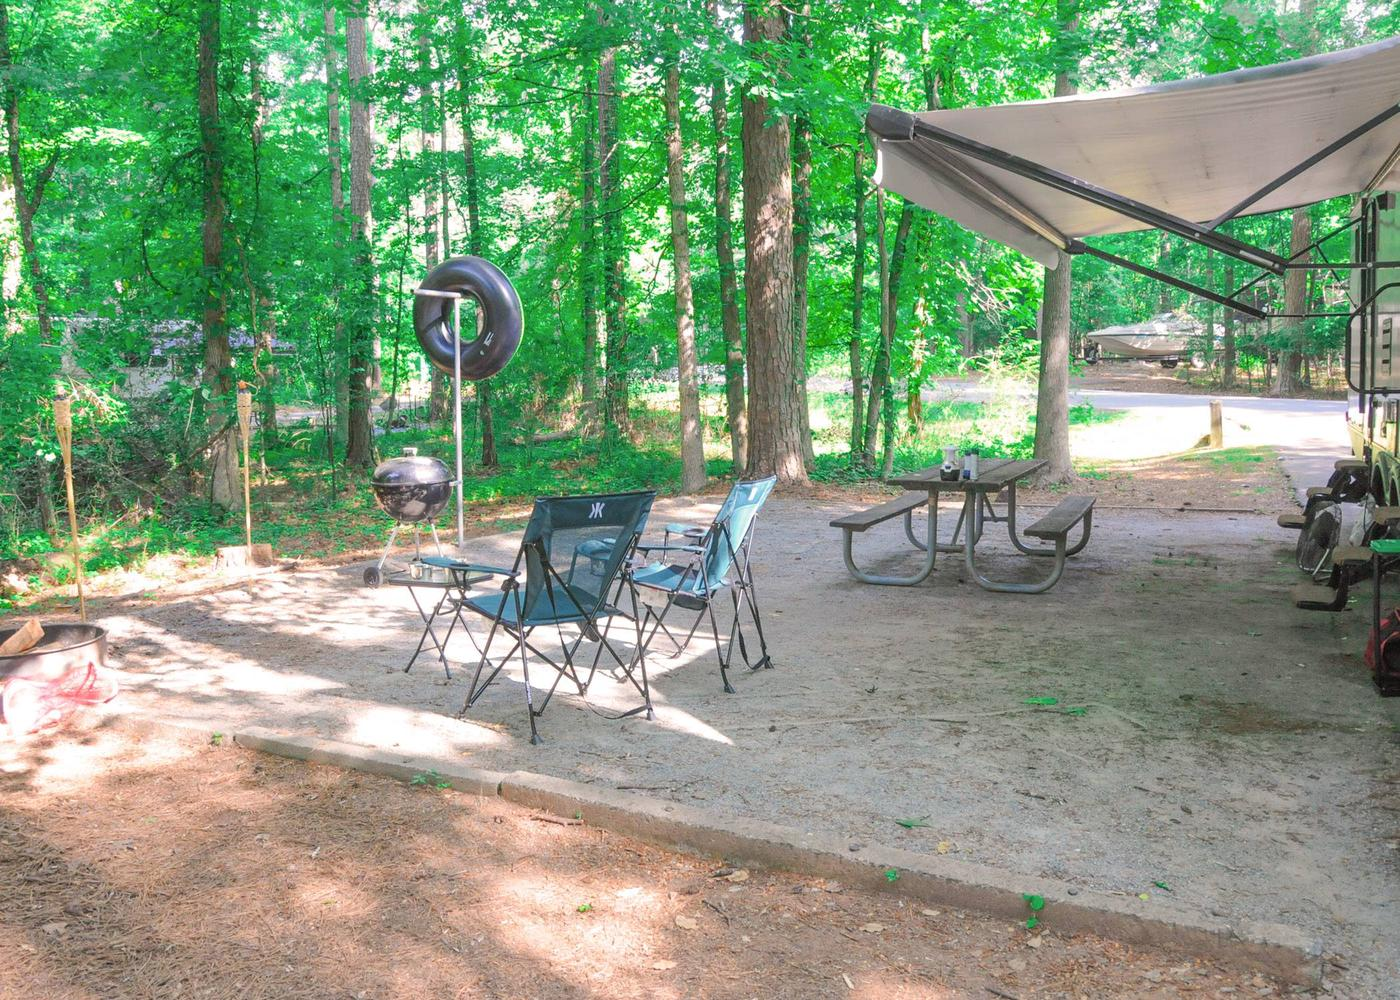 Campsite view.Victoria Campground, campsite 38.